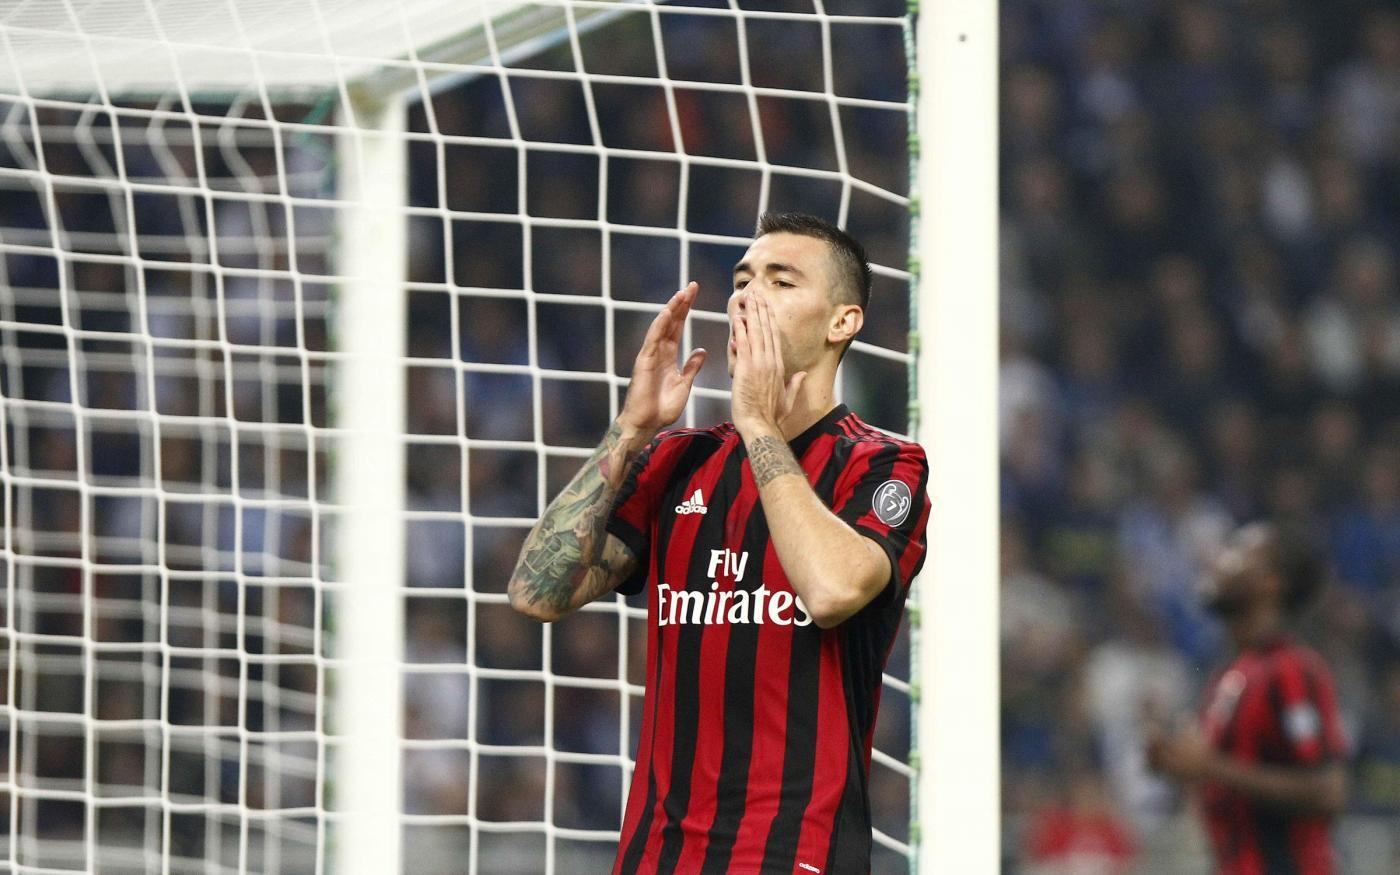 Serie A, Inter-Milan 3-2: le foto | Foto - Sportmediaset